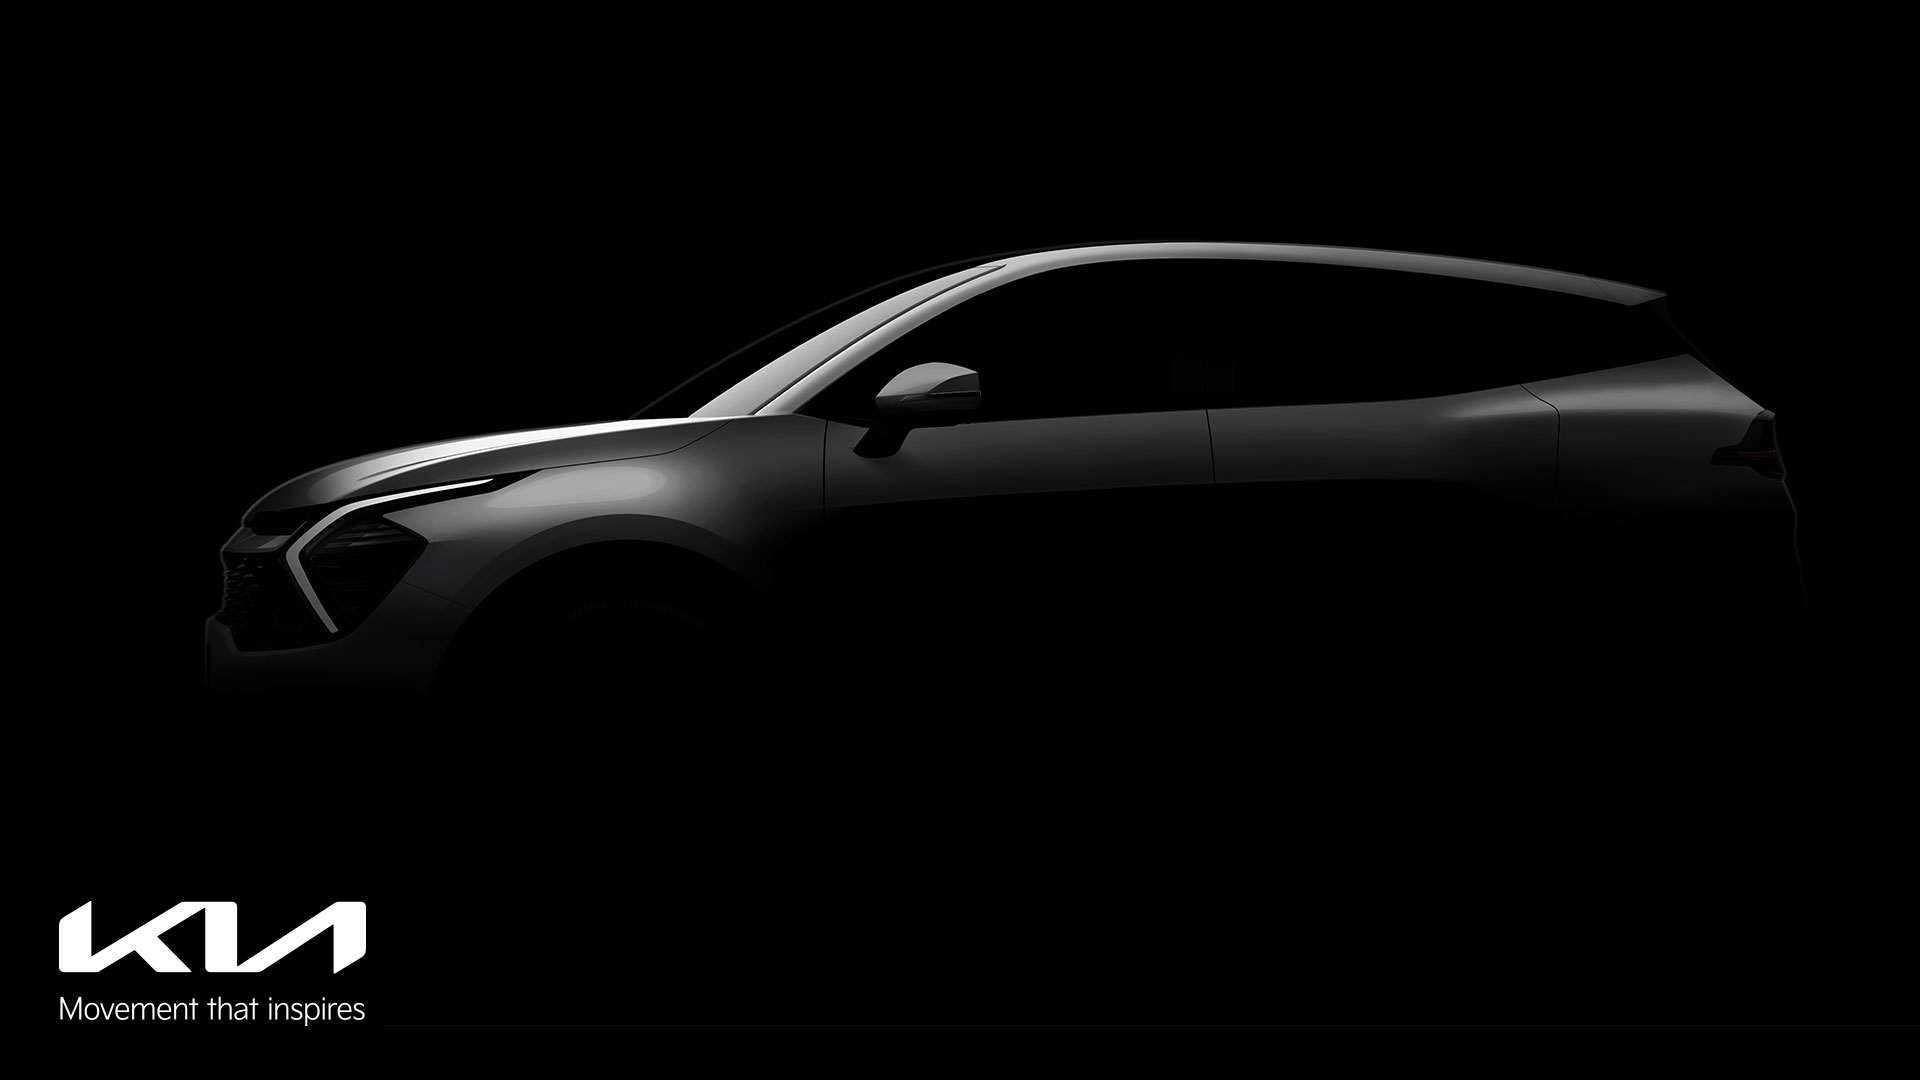 Mercedes-Benz Italia partner dei Centri di Guida Sicura ACI - image Kia on https://motori.net